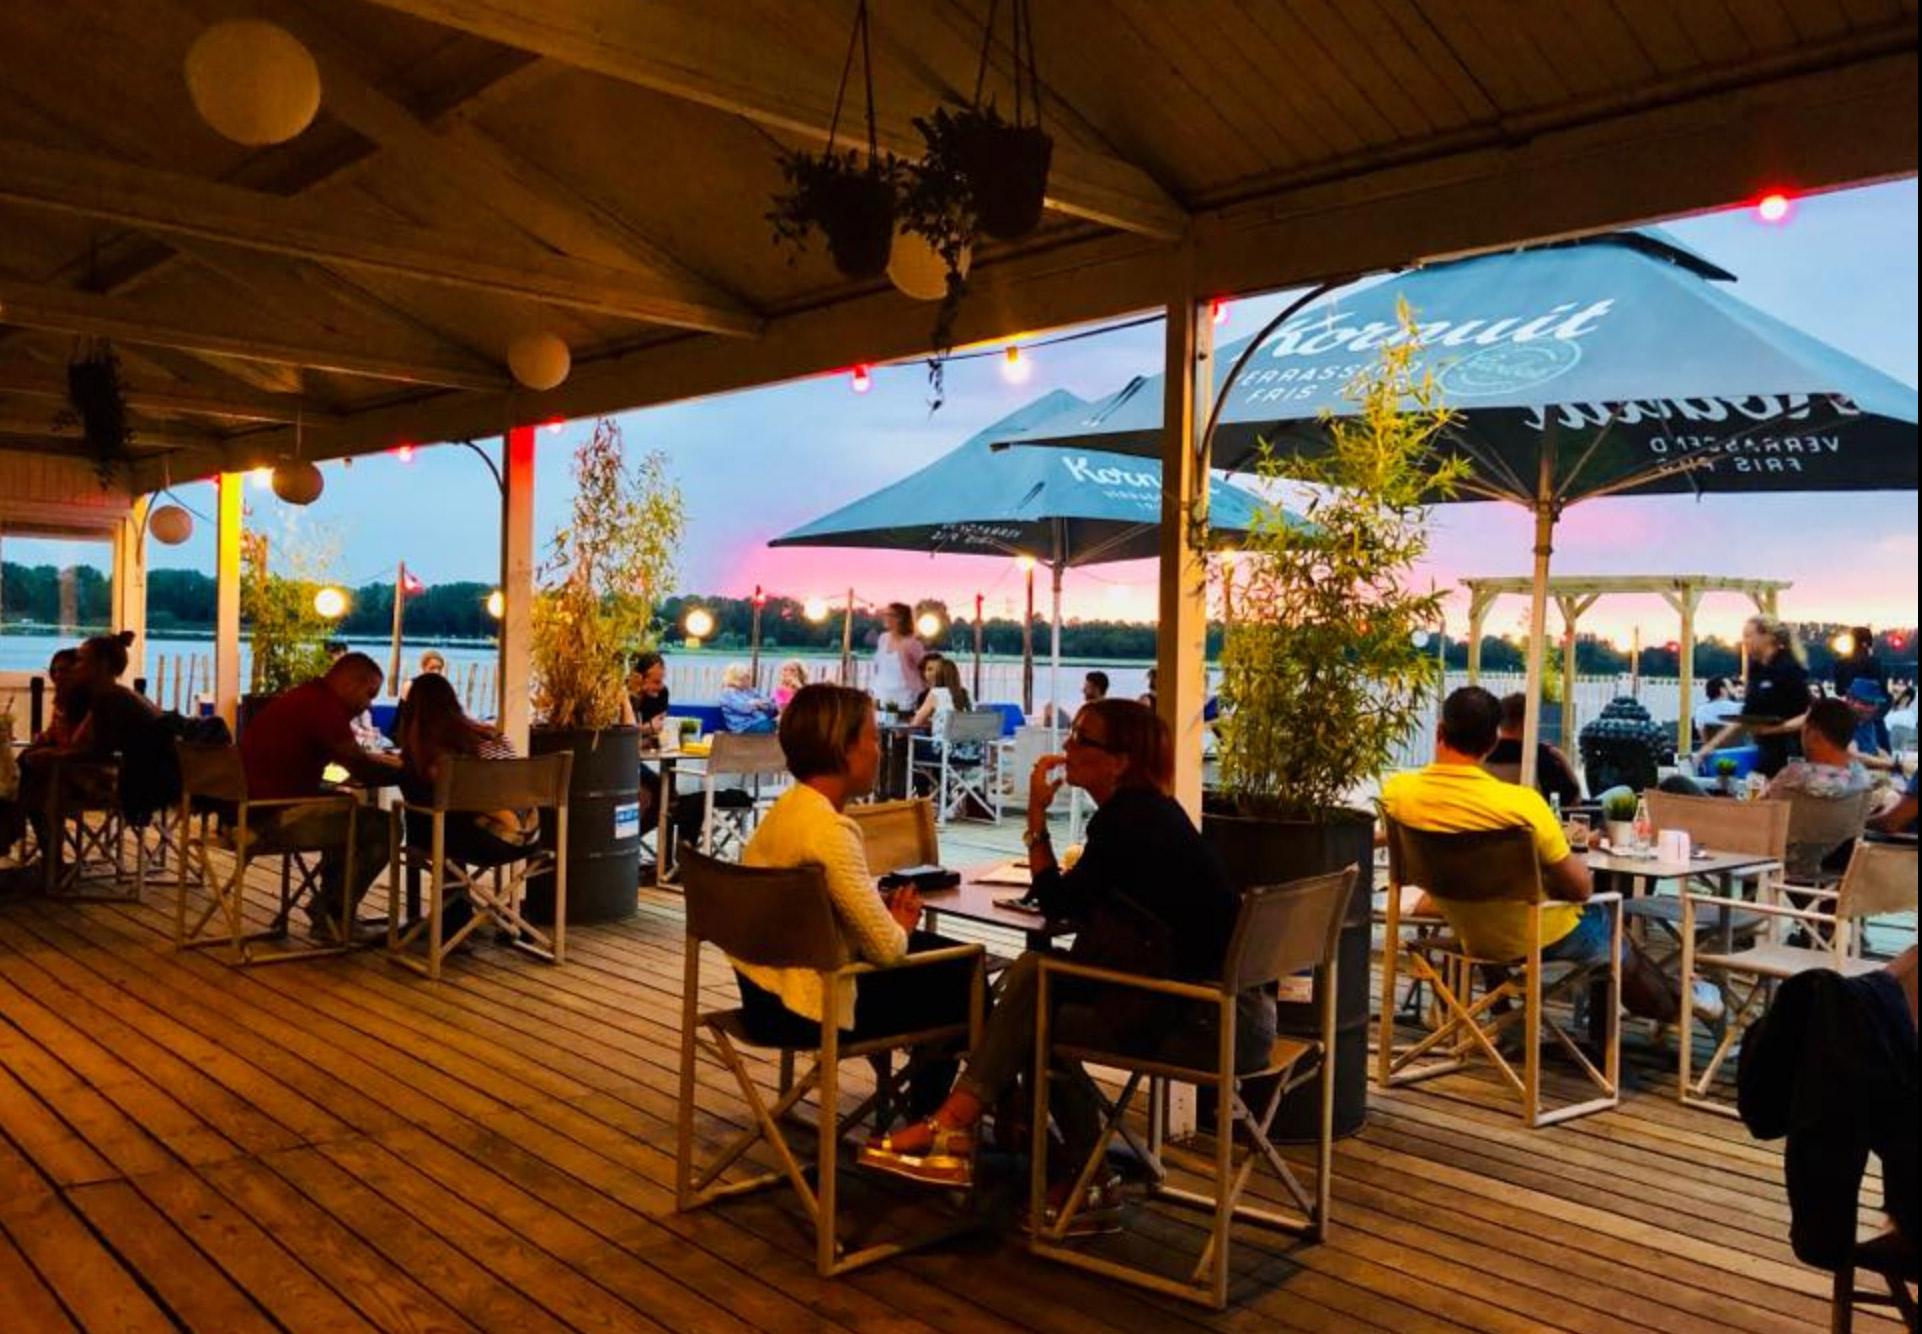 __Area-X-De-Weerd-Roermond-Beachclub-Sunset-Lounge1